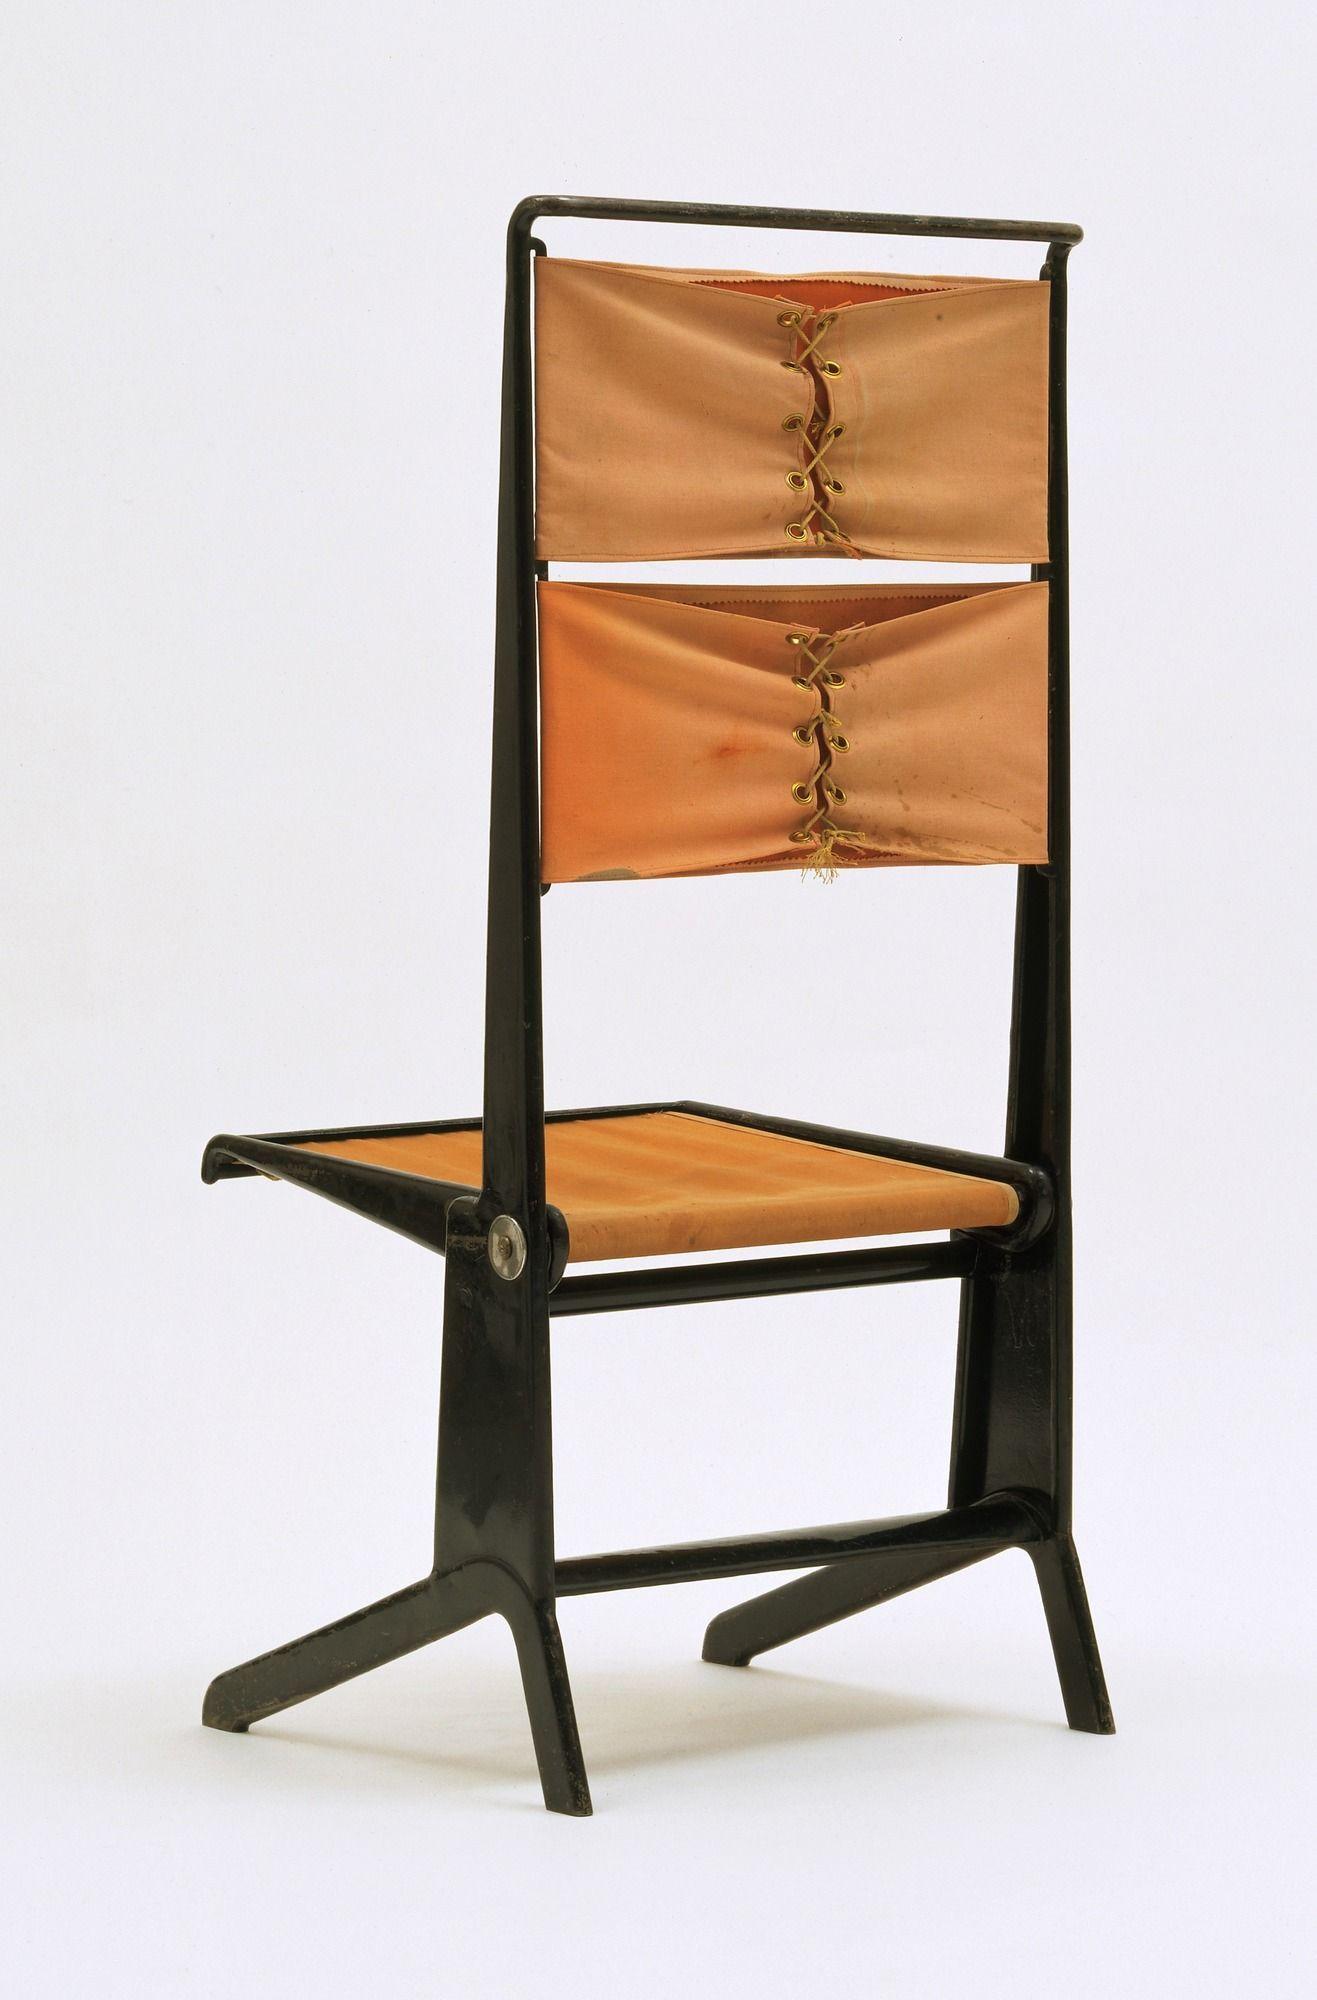 Jean Prouv & Pierre Missey Folding Chair,